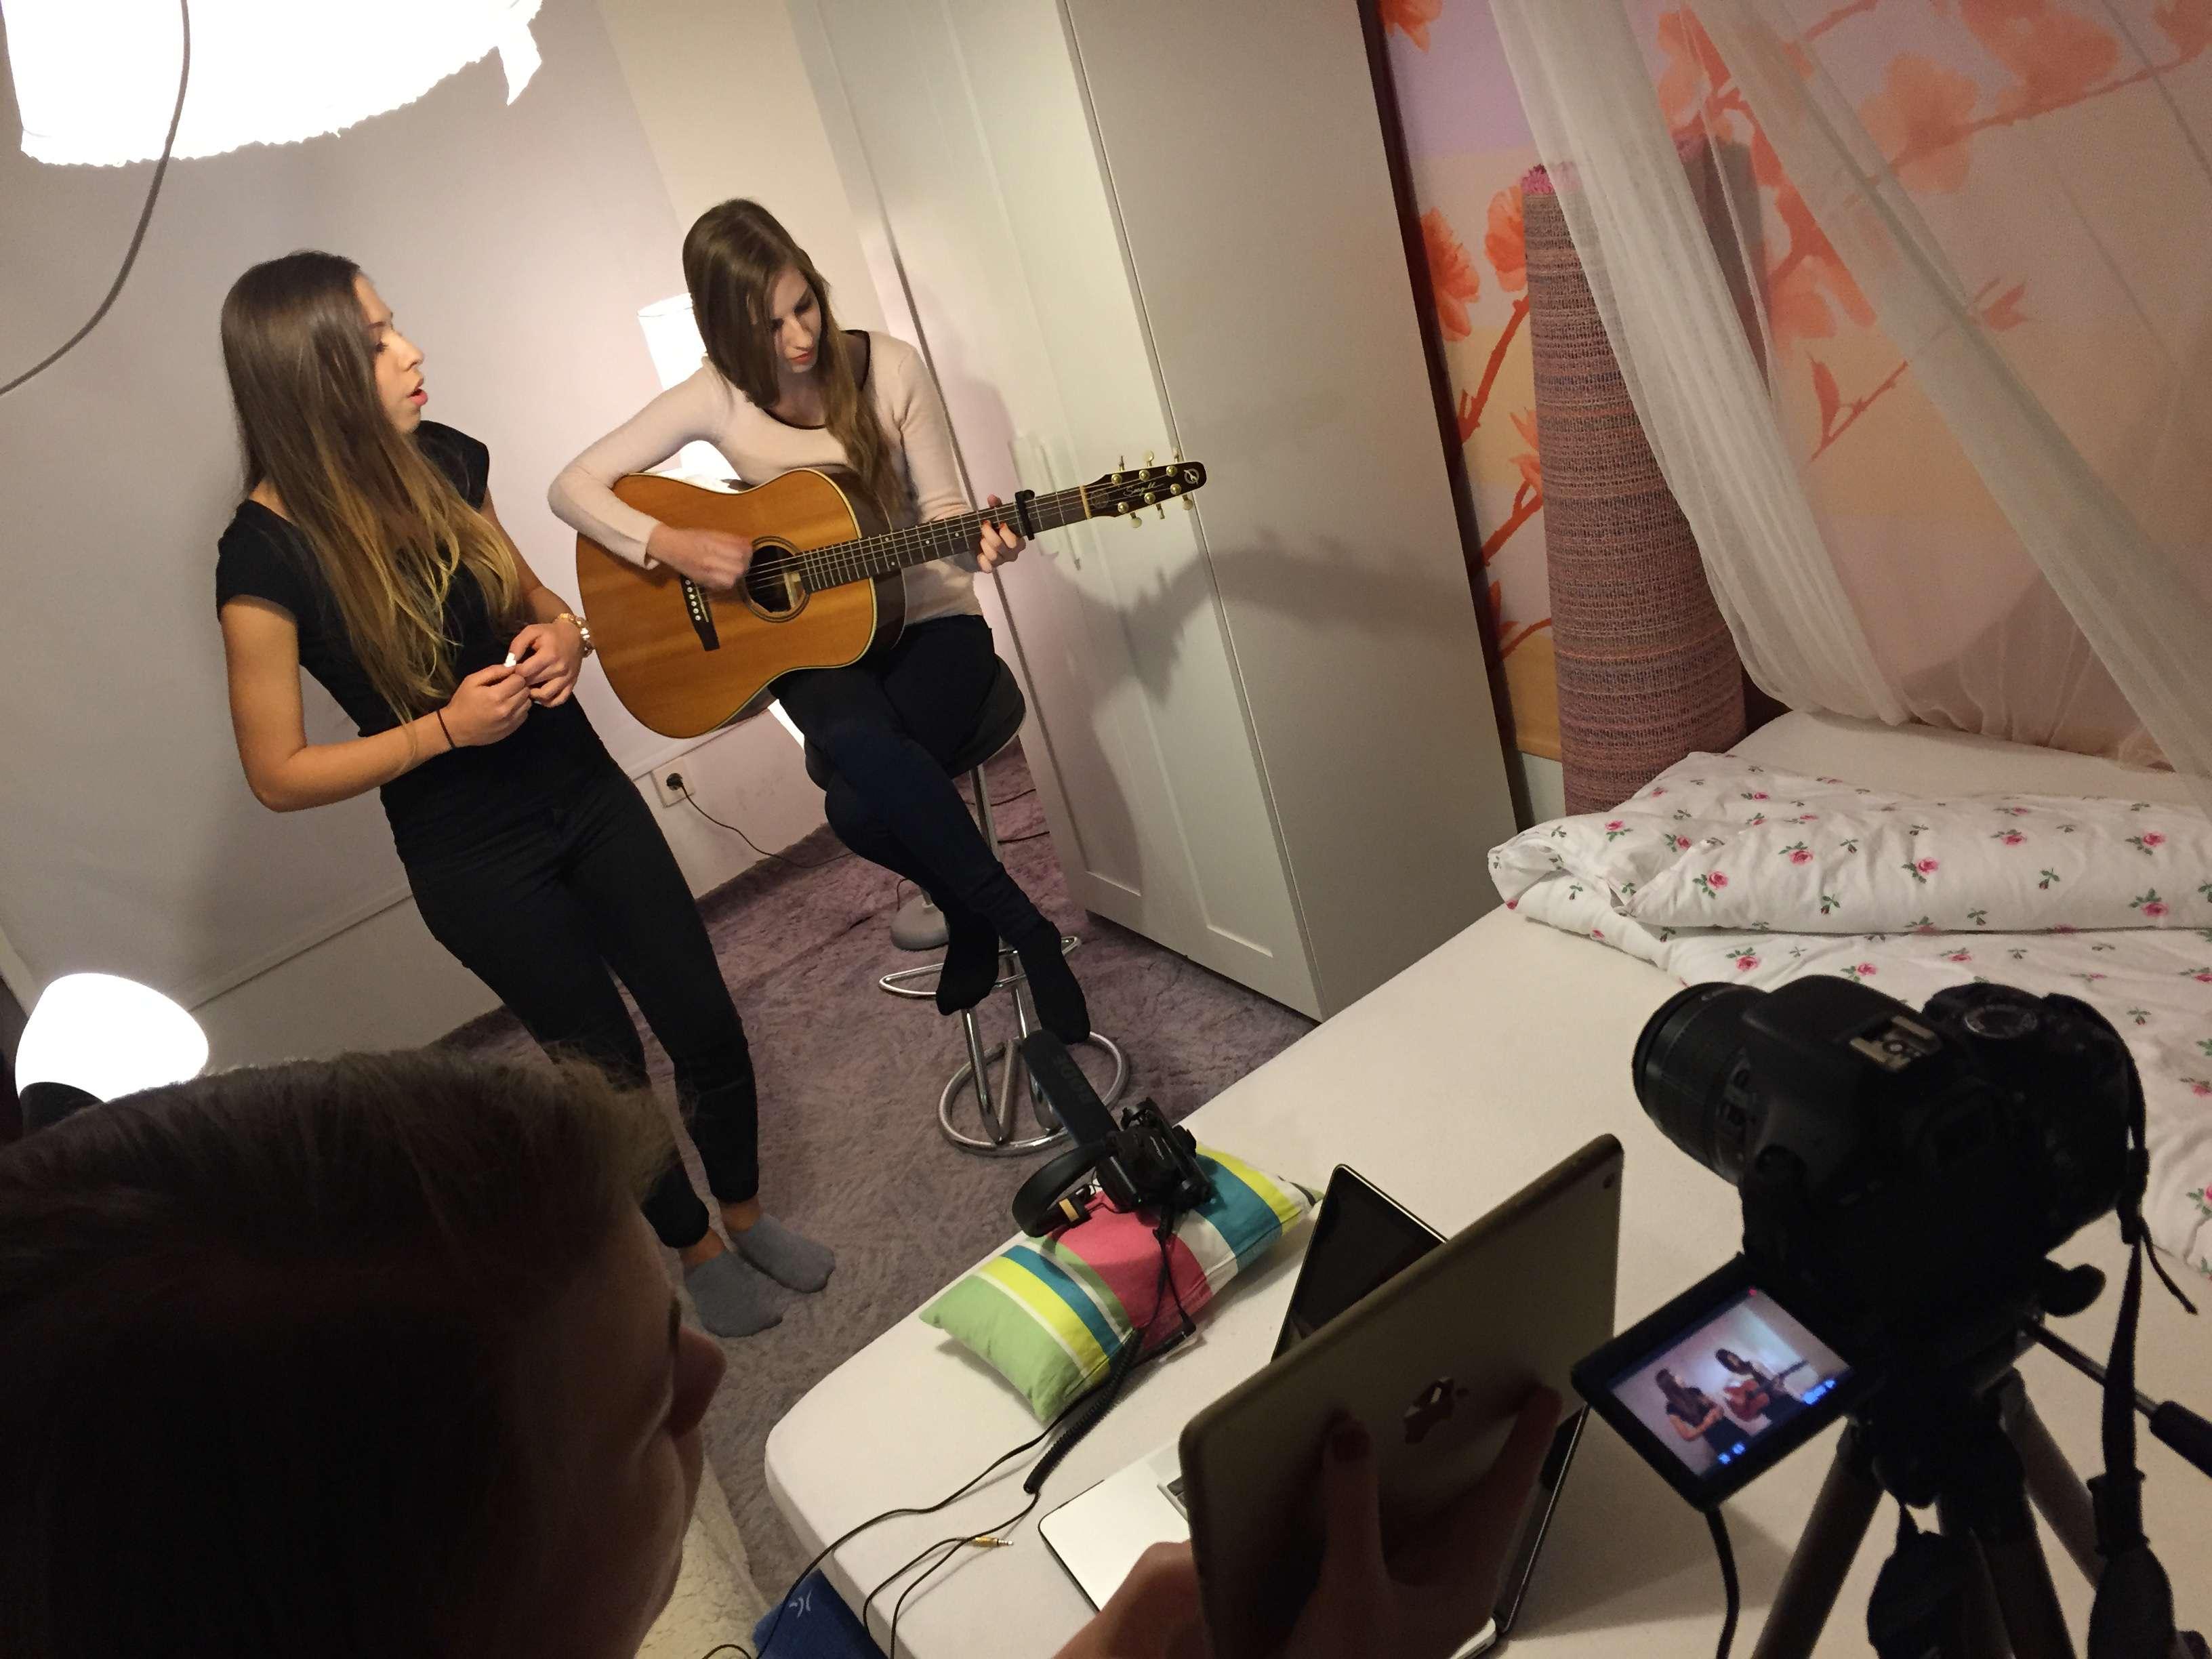 Durkó Heléna & Leona | Tori Kelly | Funny | COVER